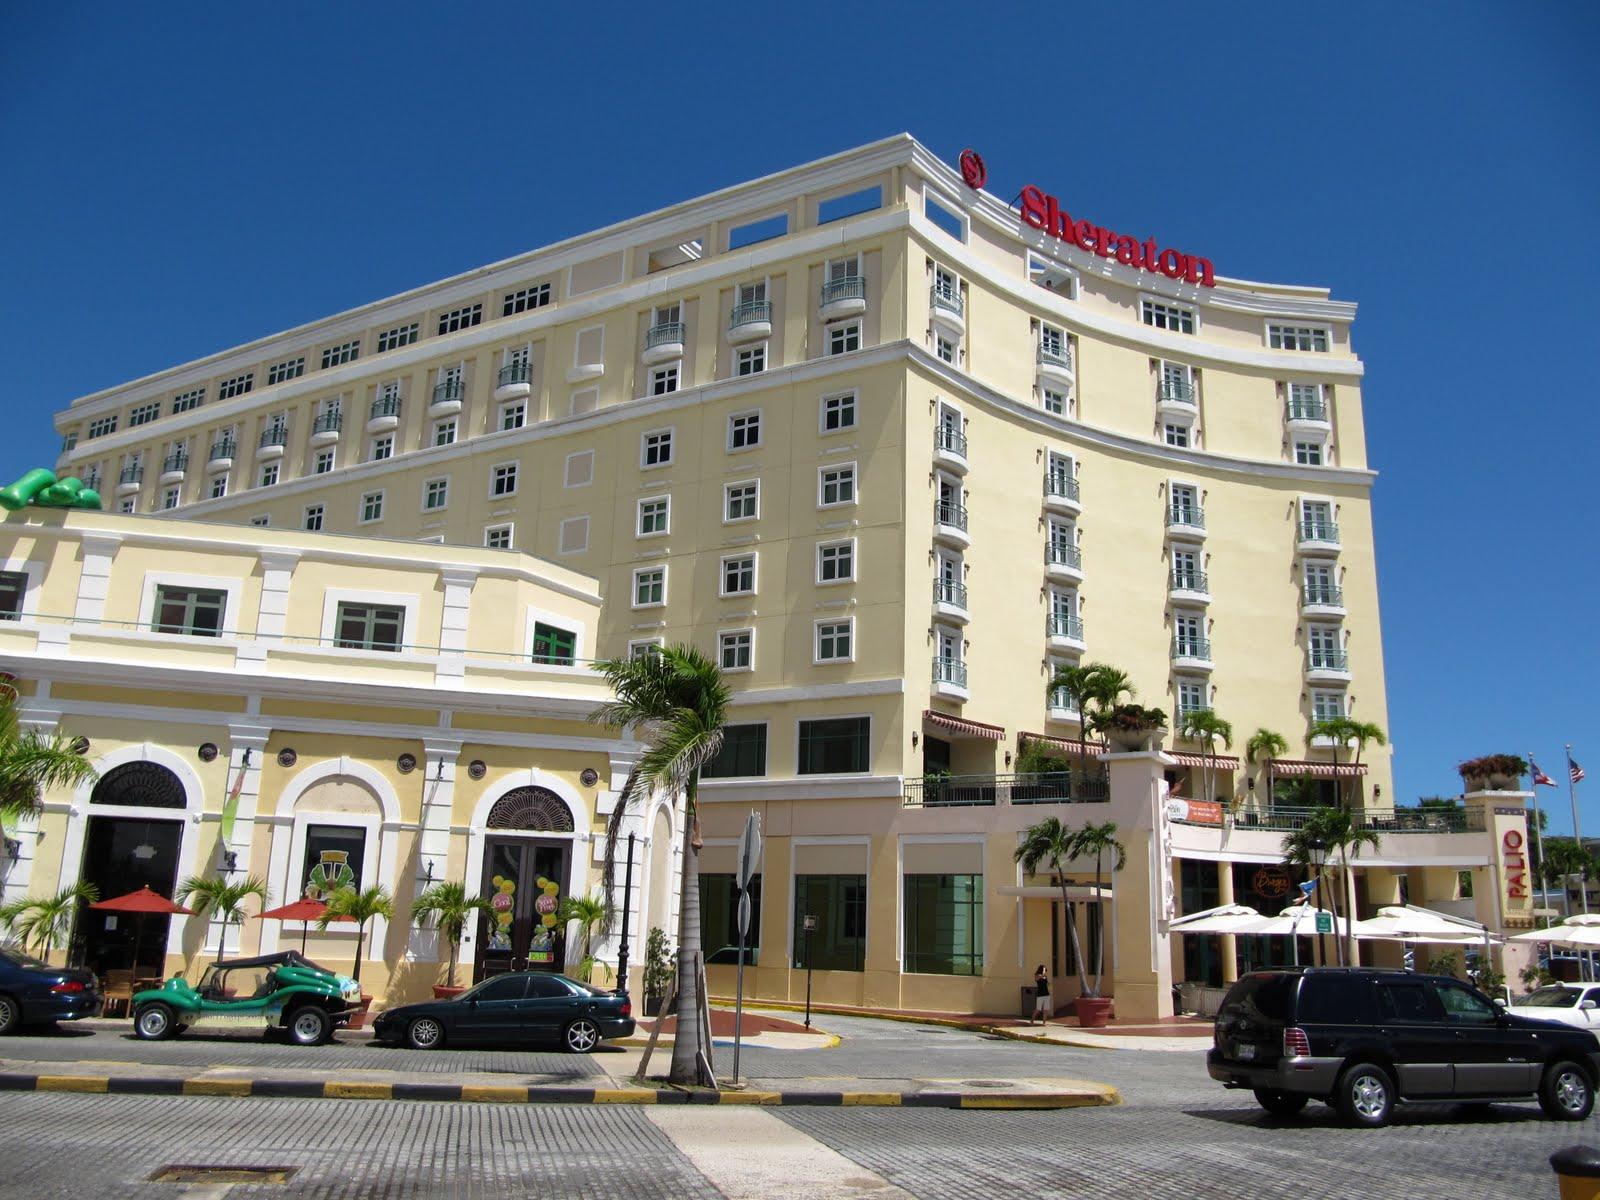 Casino in old san juan puerto rico